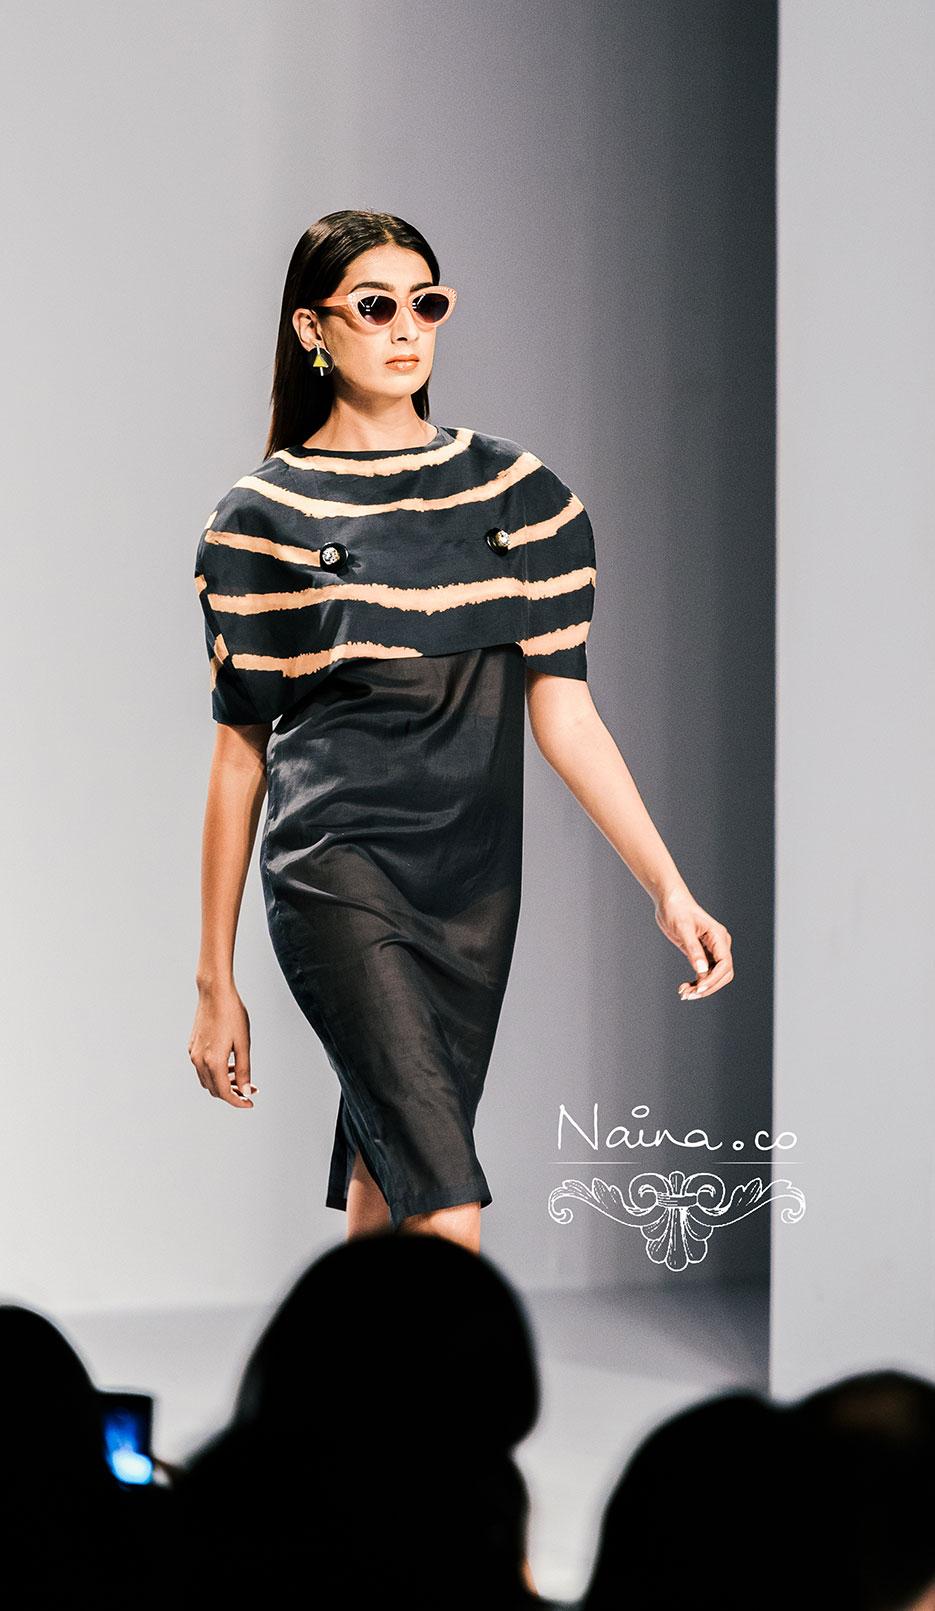 Wills Lifestyle India Fashion Week, Spring Summer 2013. Shivan Narresh beachwear/swimwear ZIP by photographer Naina Redhu of Naina.co